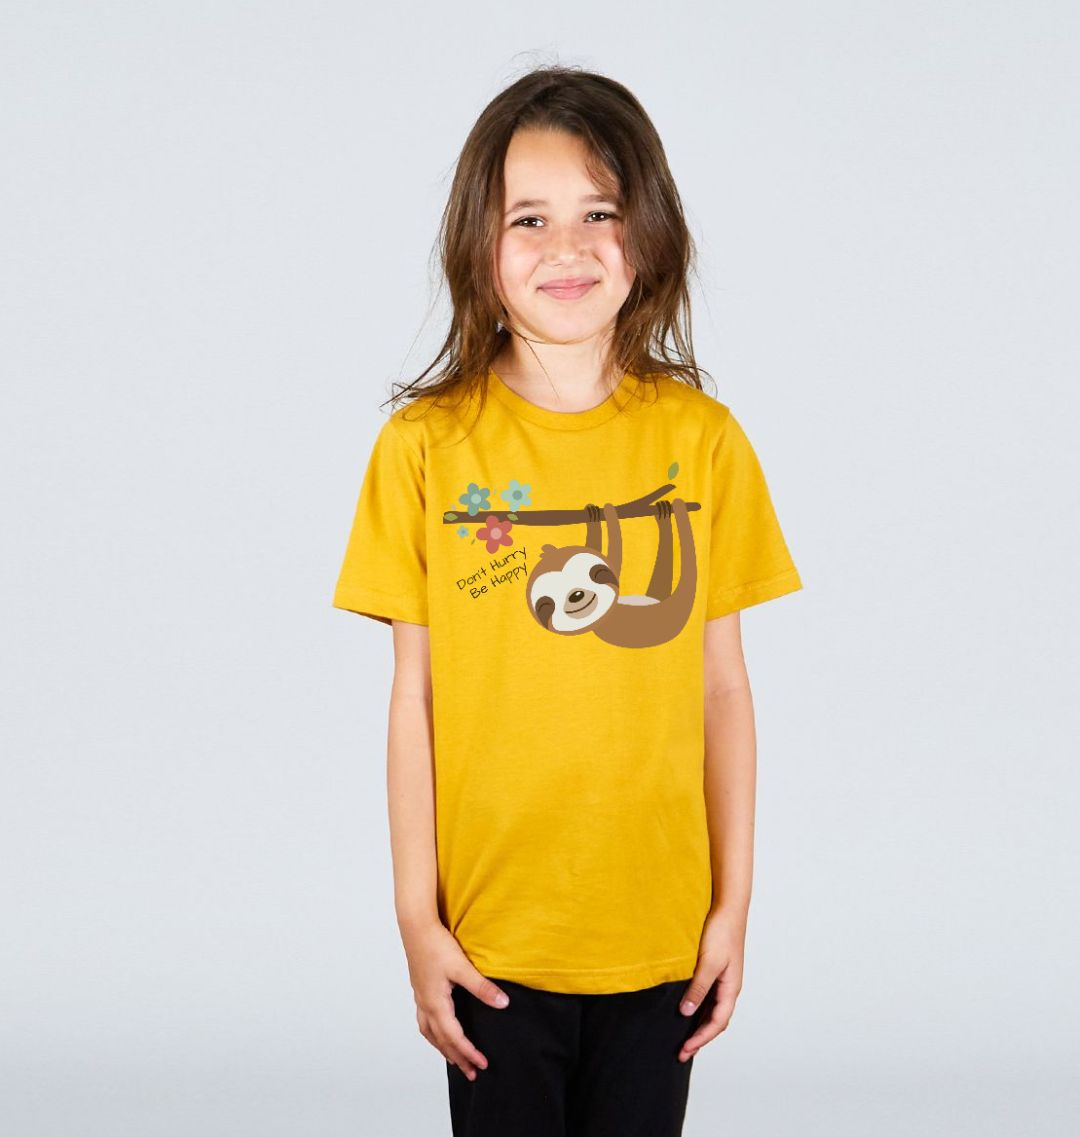 Don't Hurry Be Happy Cute Sloth Children's Organic Cotton T Shirt mustard yellow